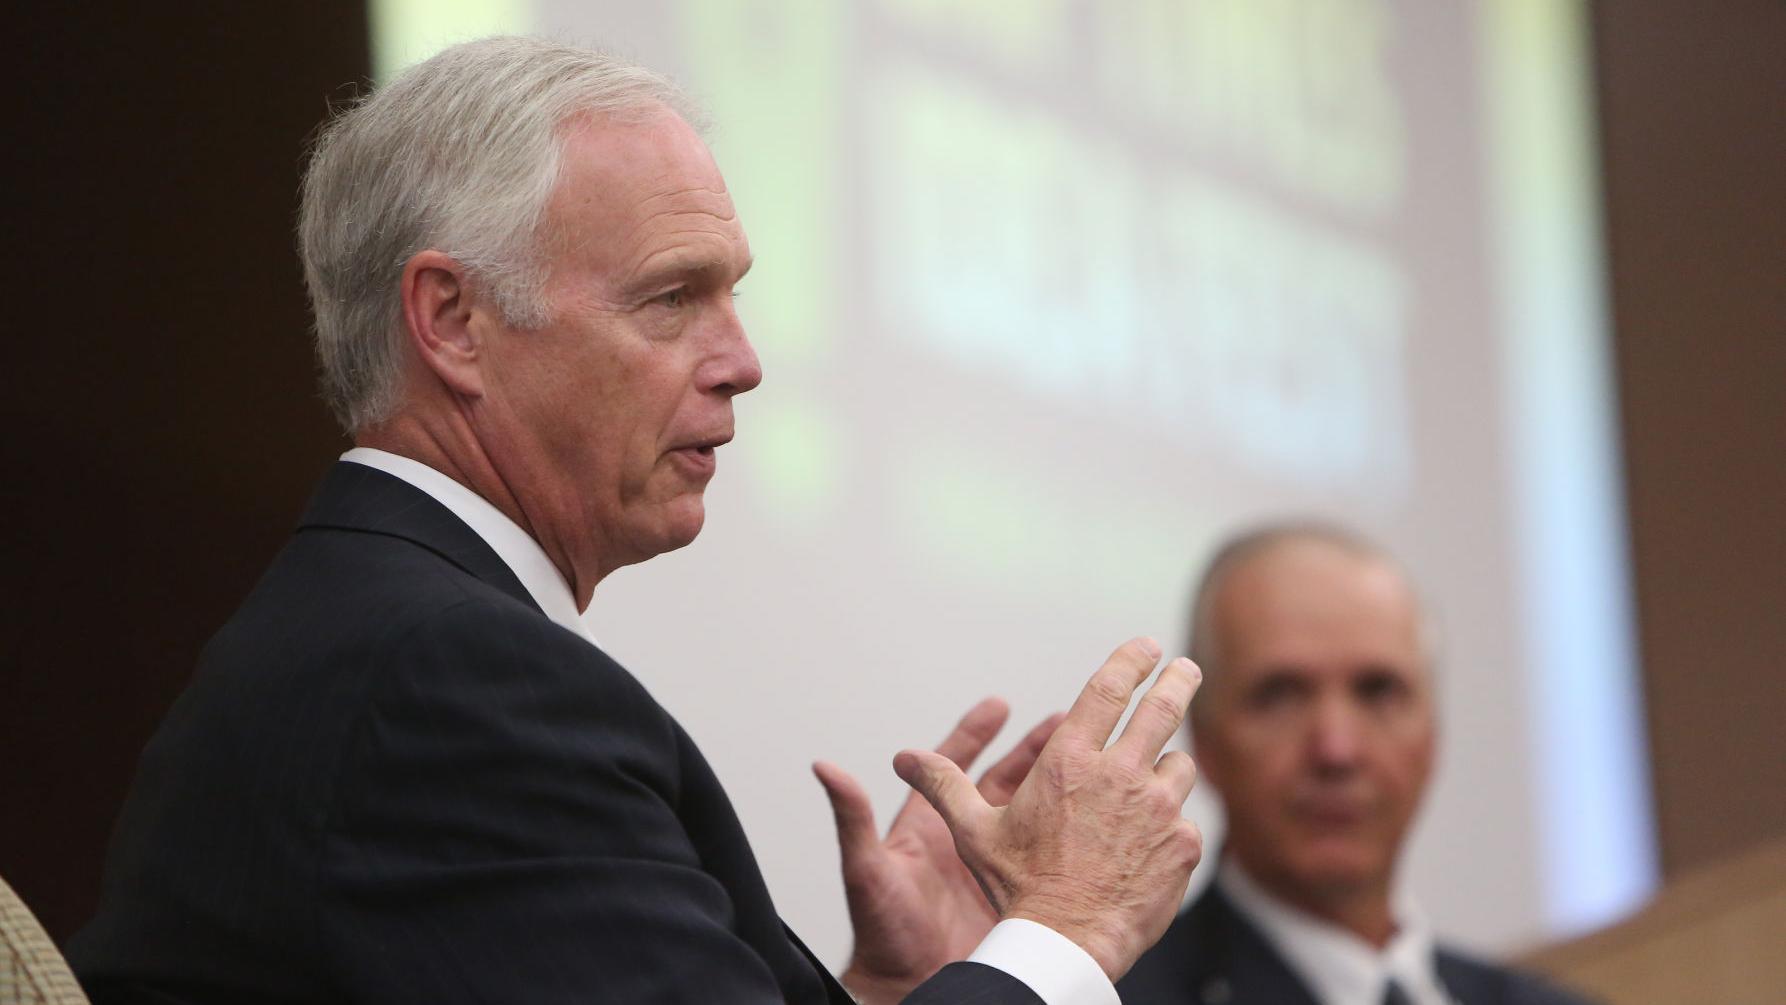 Ron Johnson: Senate scorekeepers' projection that tax bill boosts debt by $1 trillion 'a joke'